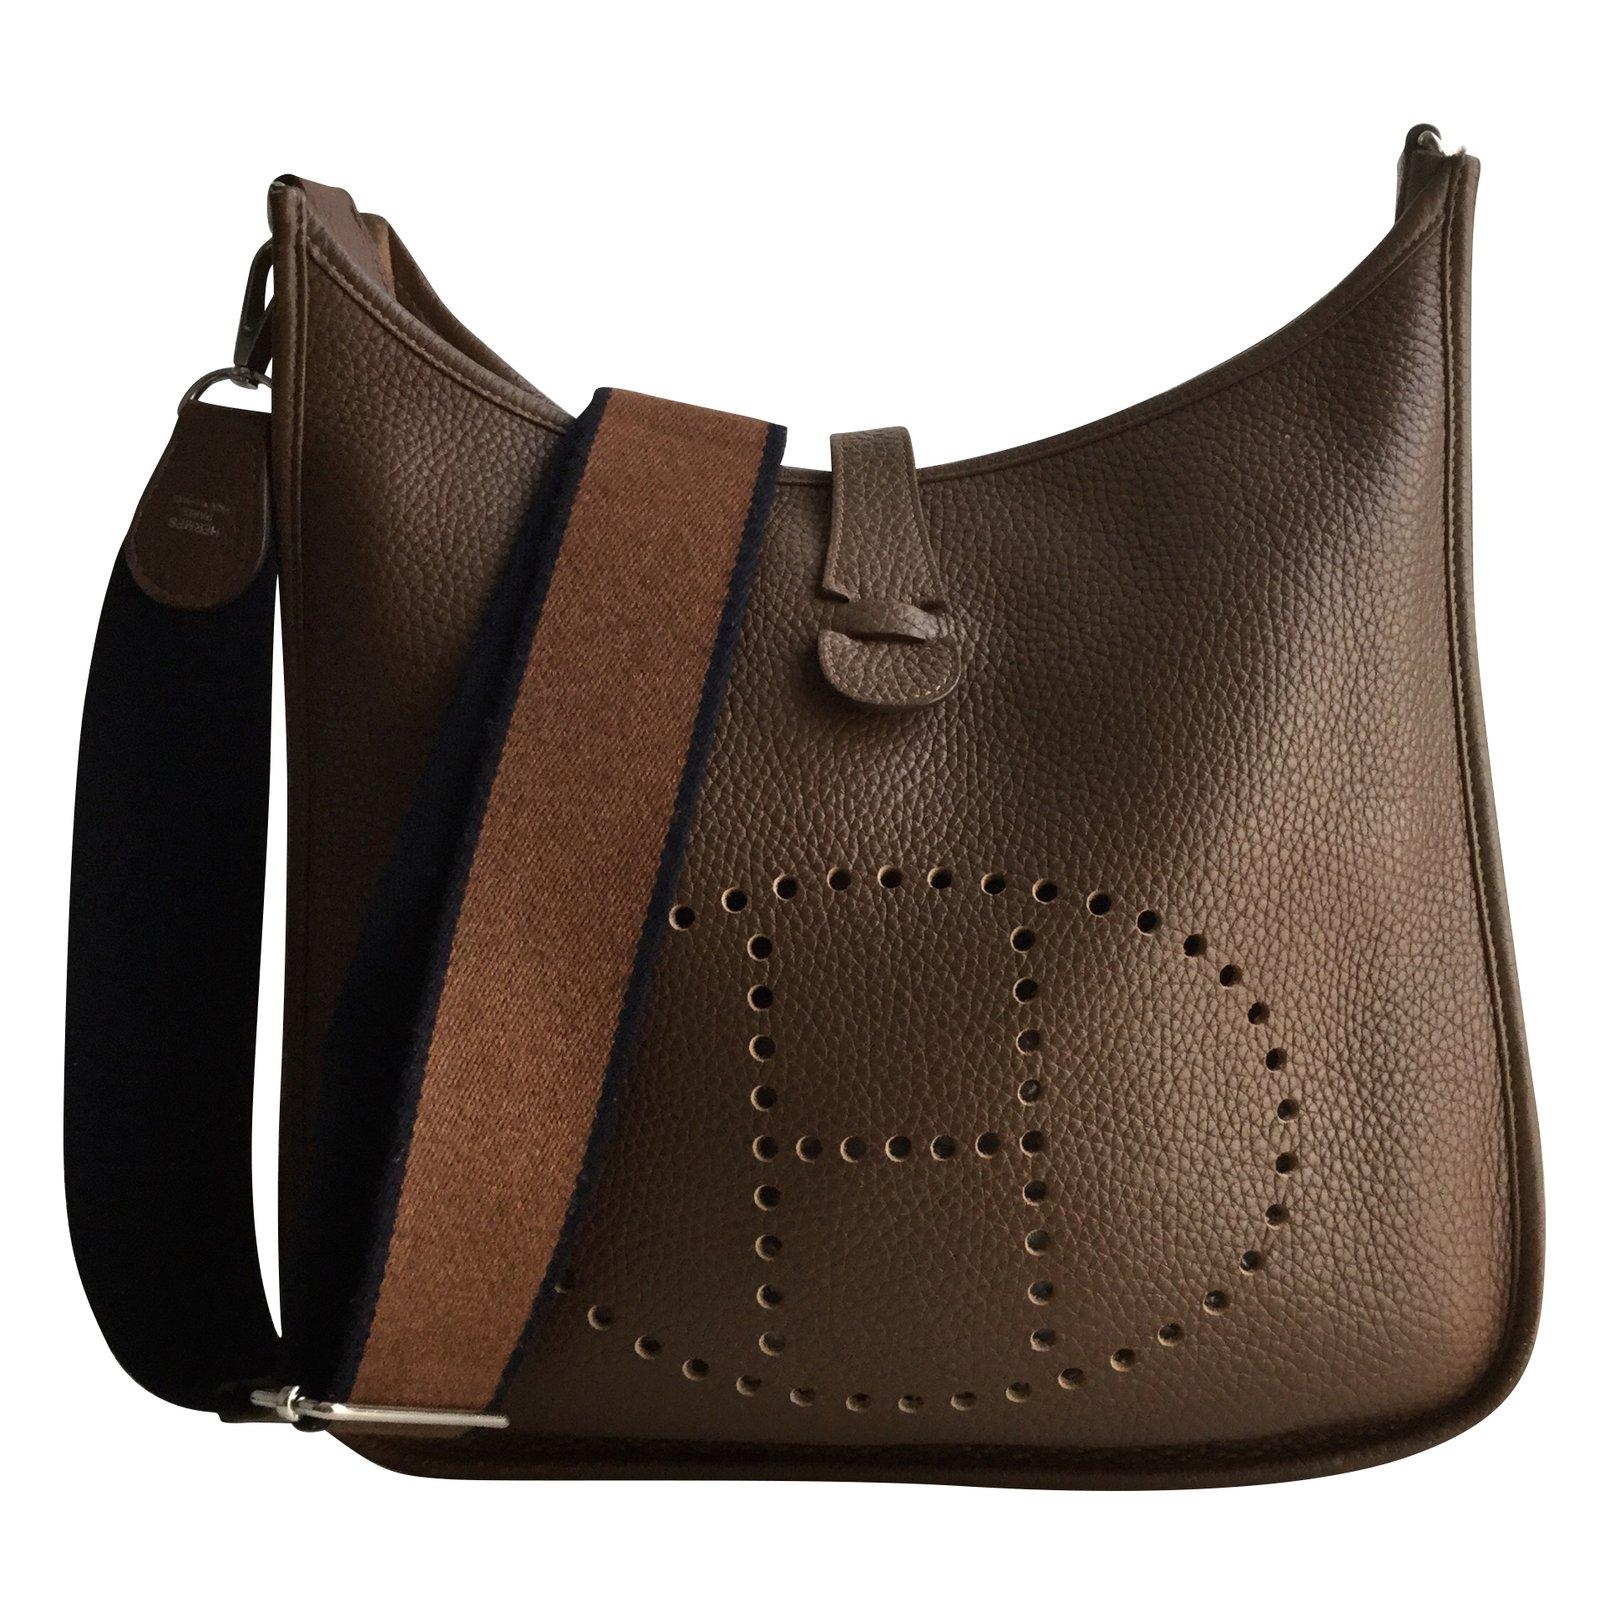 54c166ea339e Hermès Evelyne III Handbags Leather Brown ref.56828 - Joli Closet